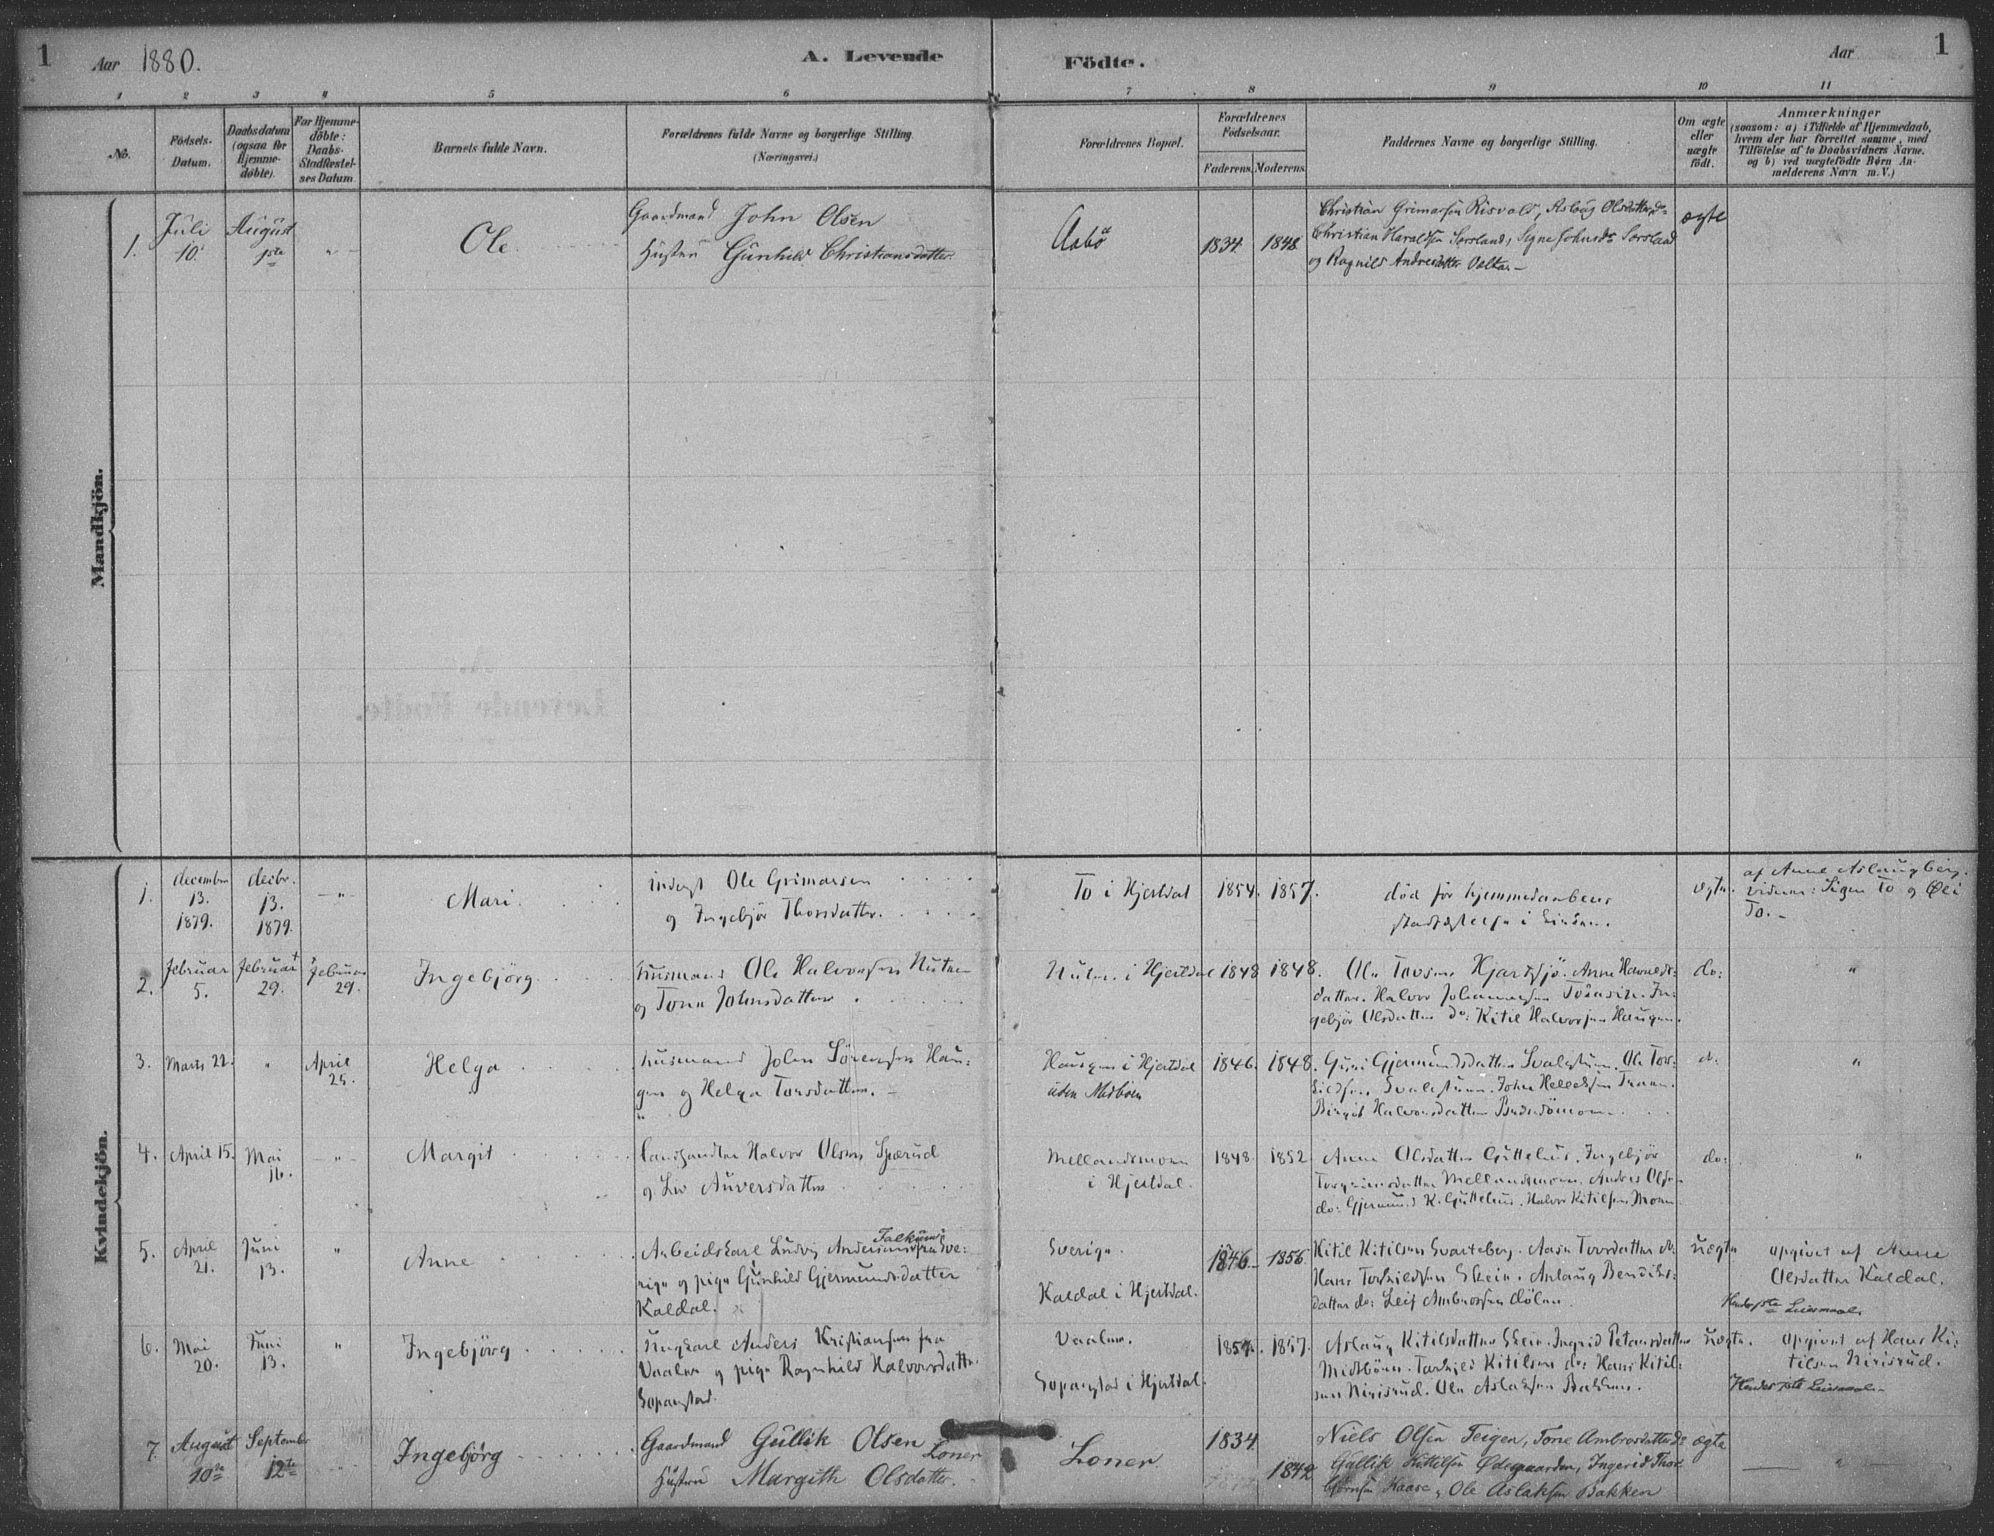 SAKO, Hjartdal kirkebøker, F/Fa/L0010: Ministerialbok nr. I 10, 1880-1929, s. 1